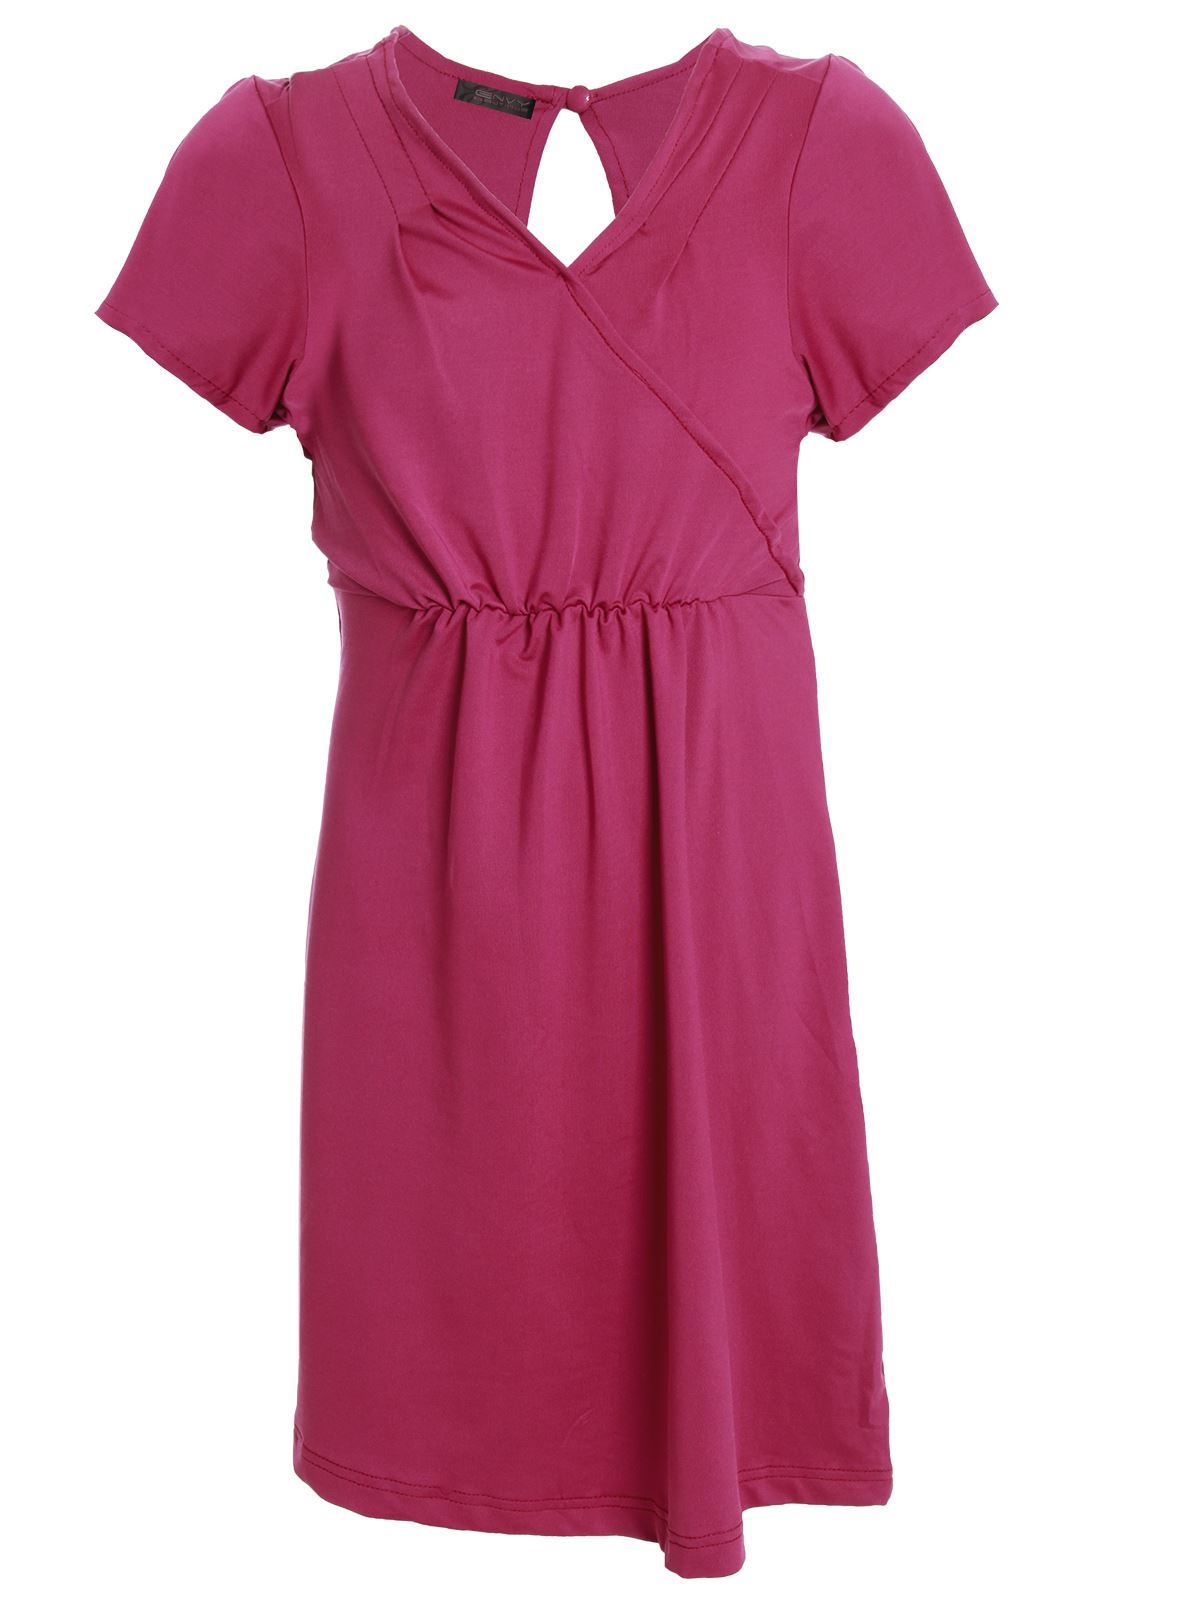 Niña Infantil Vestido De Fiesta Formal Corto mangas vestidos | eBay